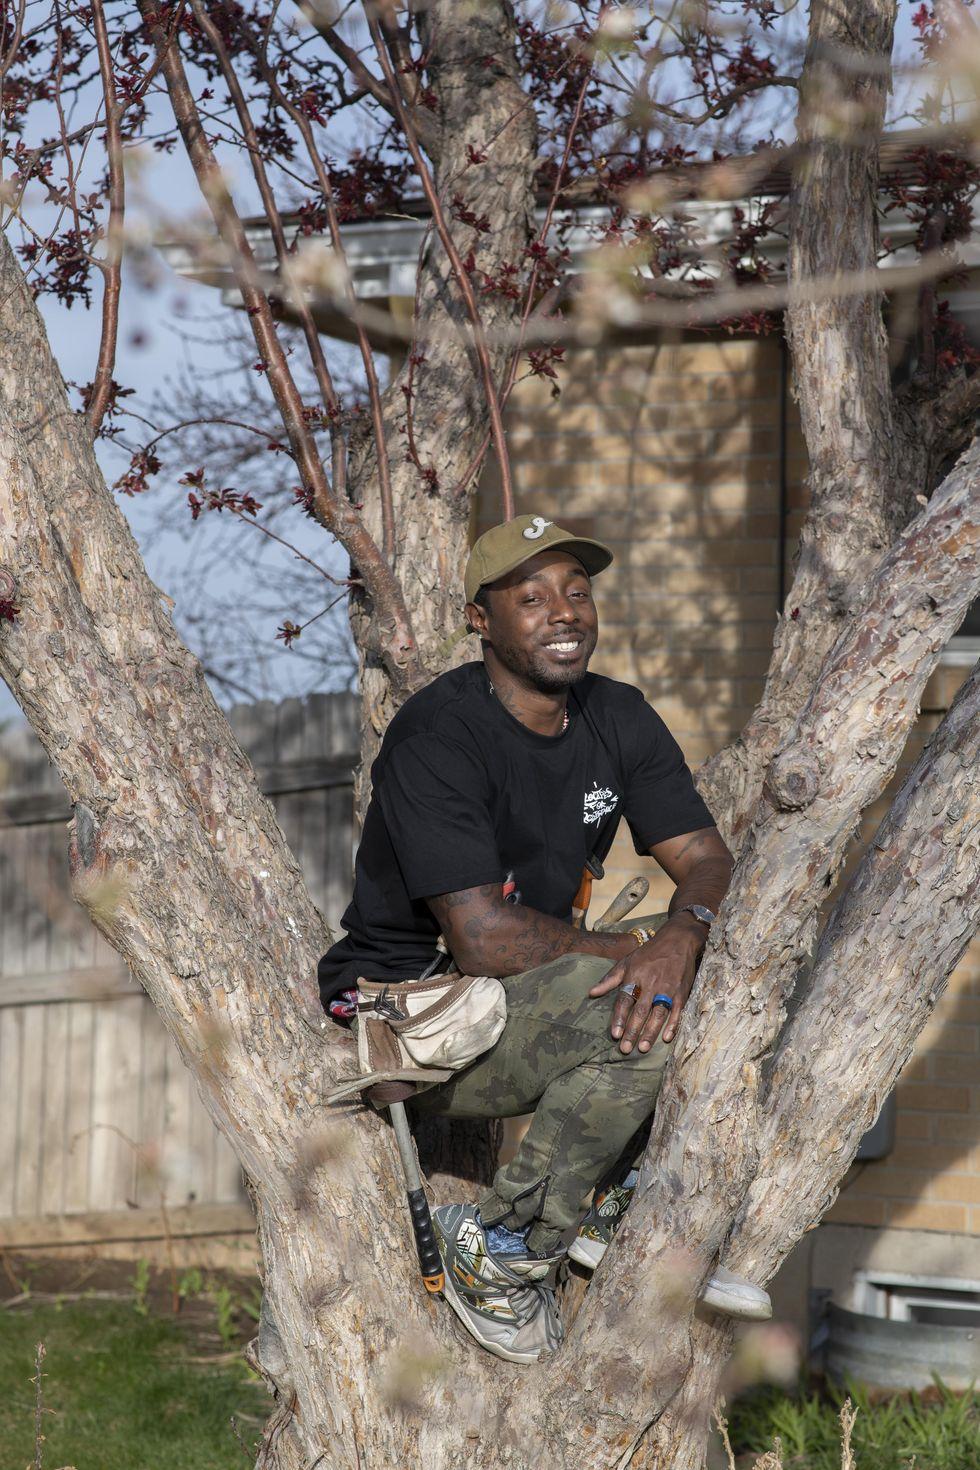 u200bVita is among a growing list of Black gardening enthusiasts-turned-entrepreneurs